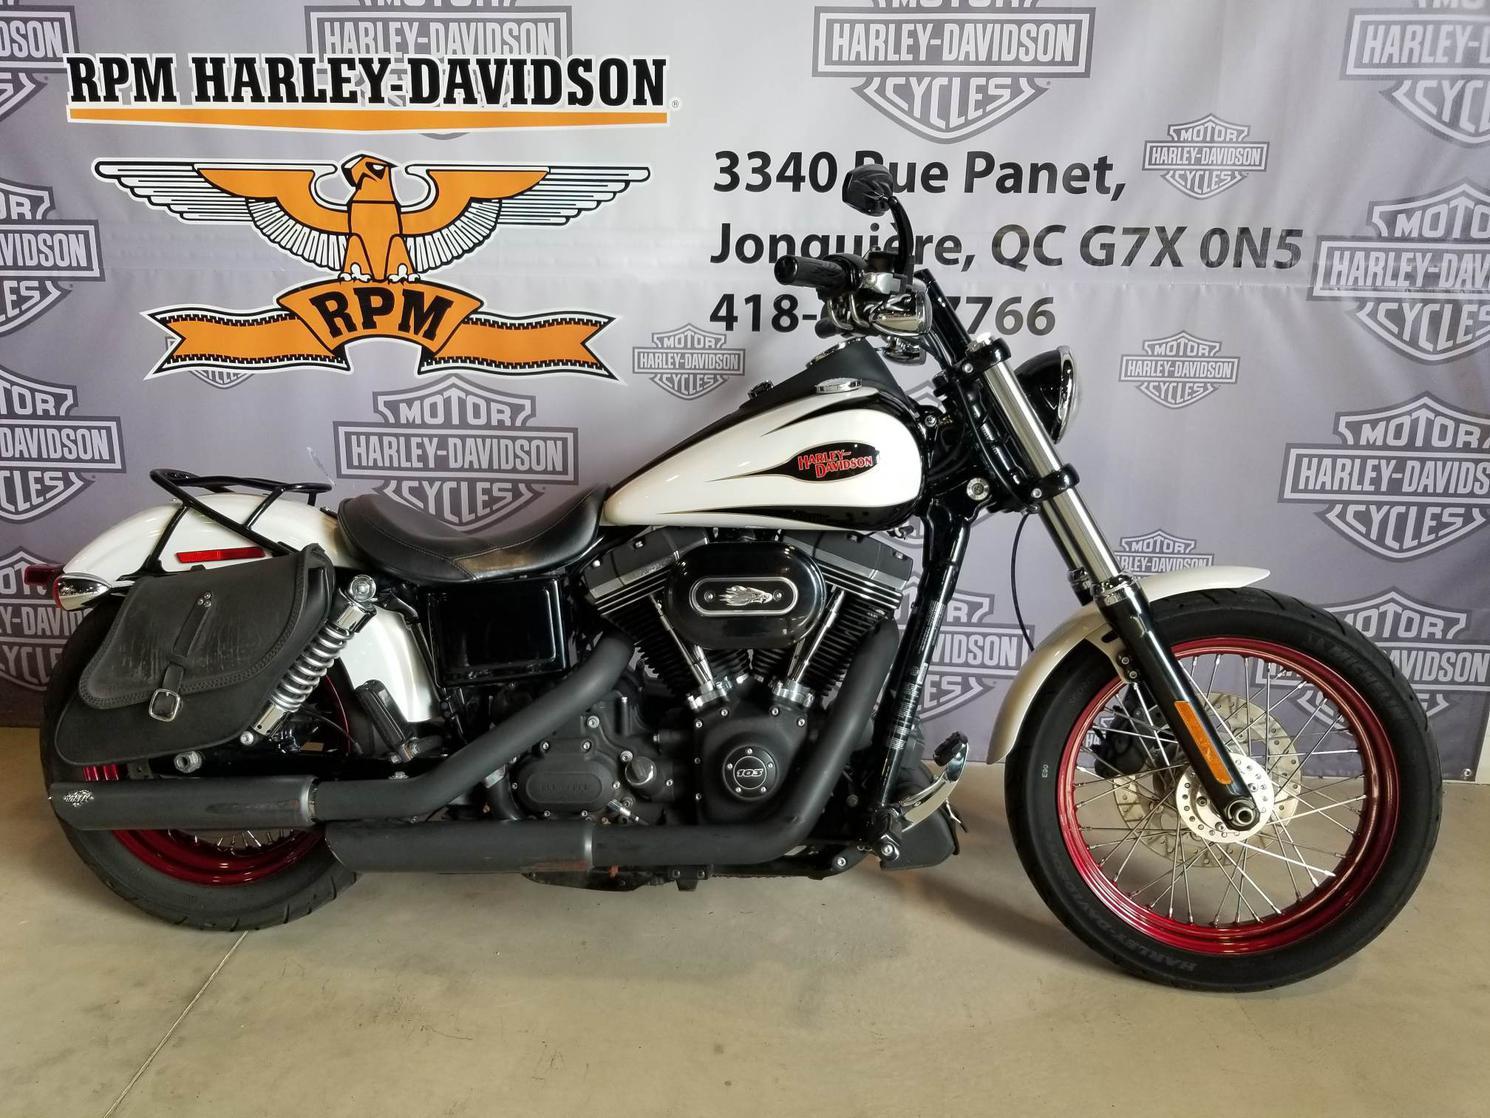 EC323063 Harley-Davidson Dyna Street Bob 2014